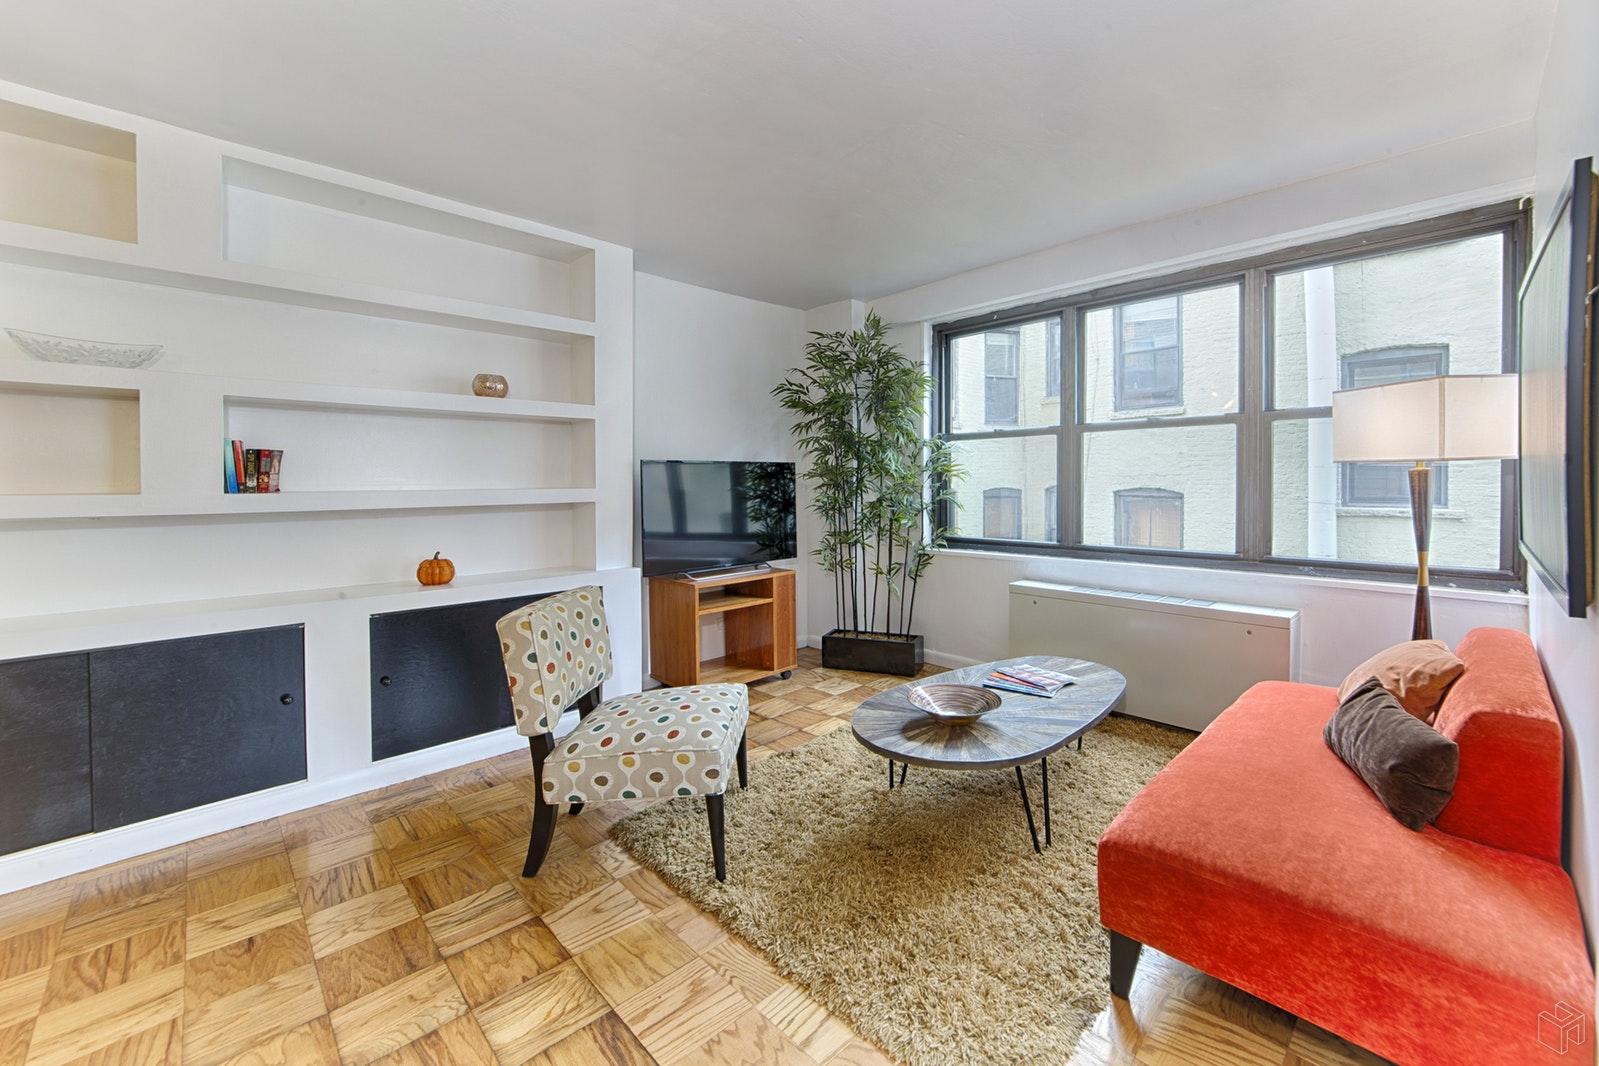 245 EAST 25TH STREET 7H, Gramercy Park, $529,000, Web #: 19117434